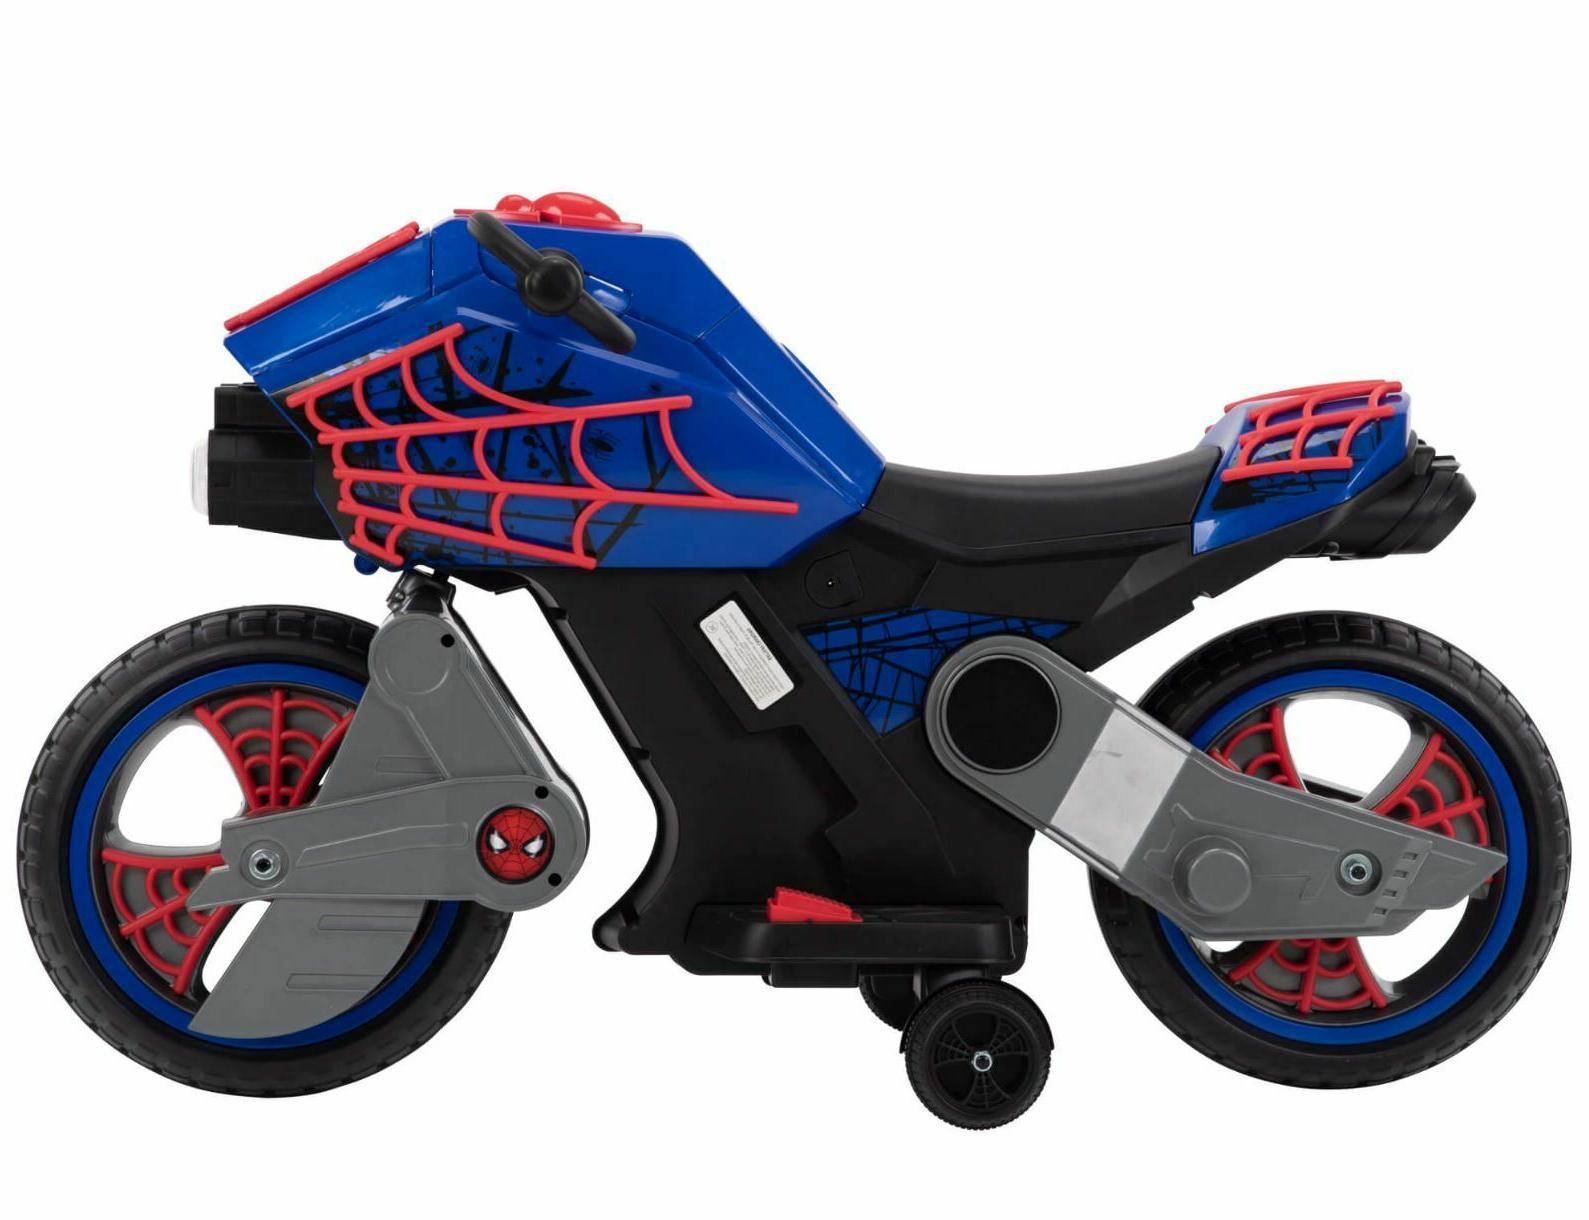 Spiderman Ride On Wheels Boys Toy Motorcycle Kids 6 Battery